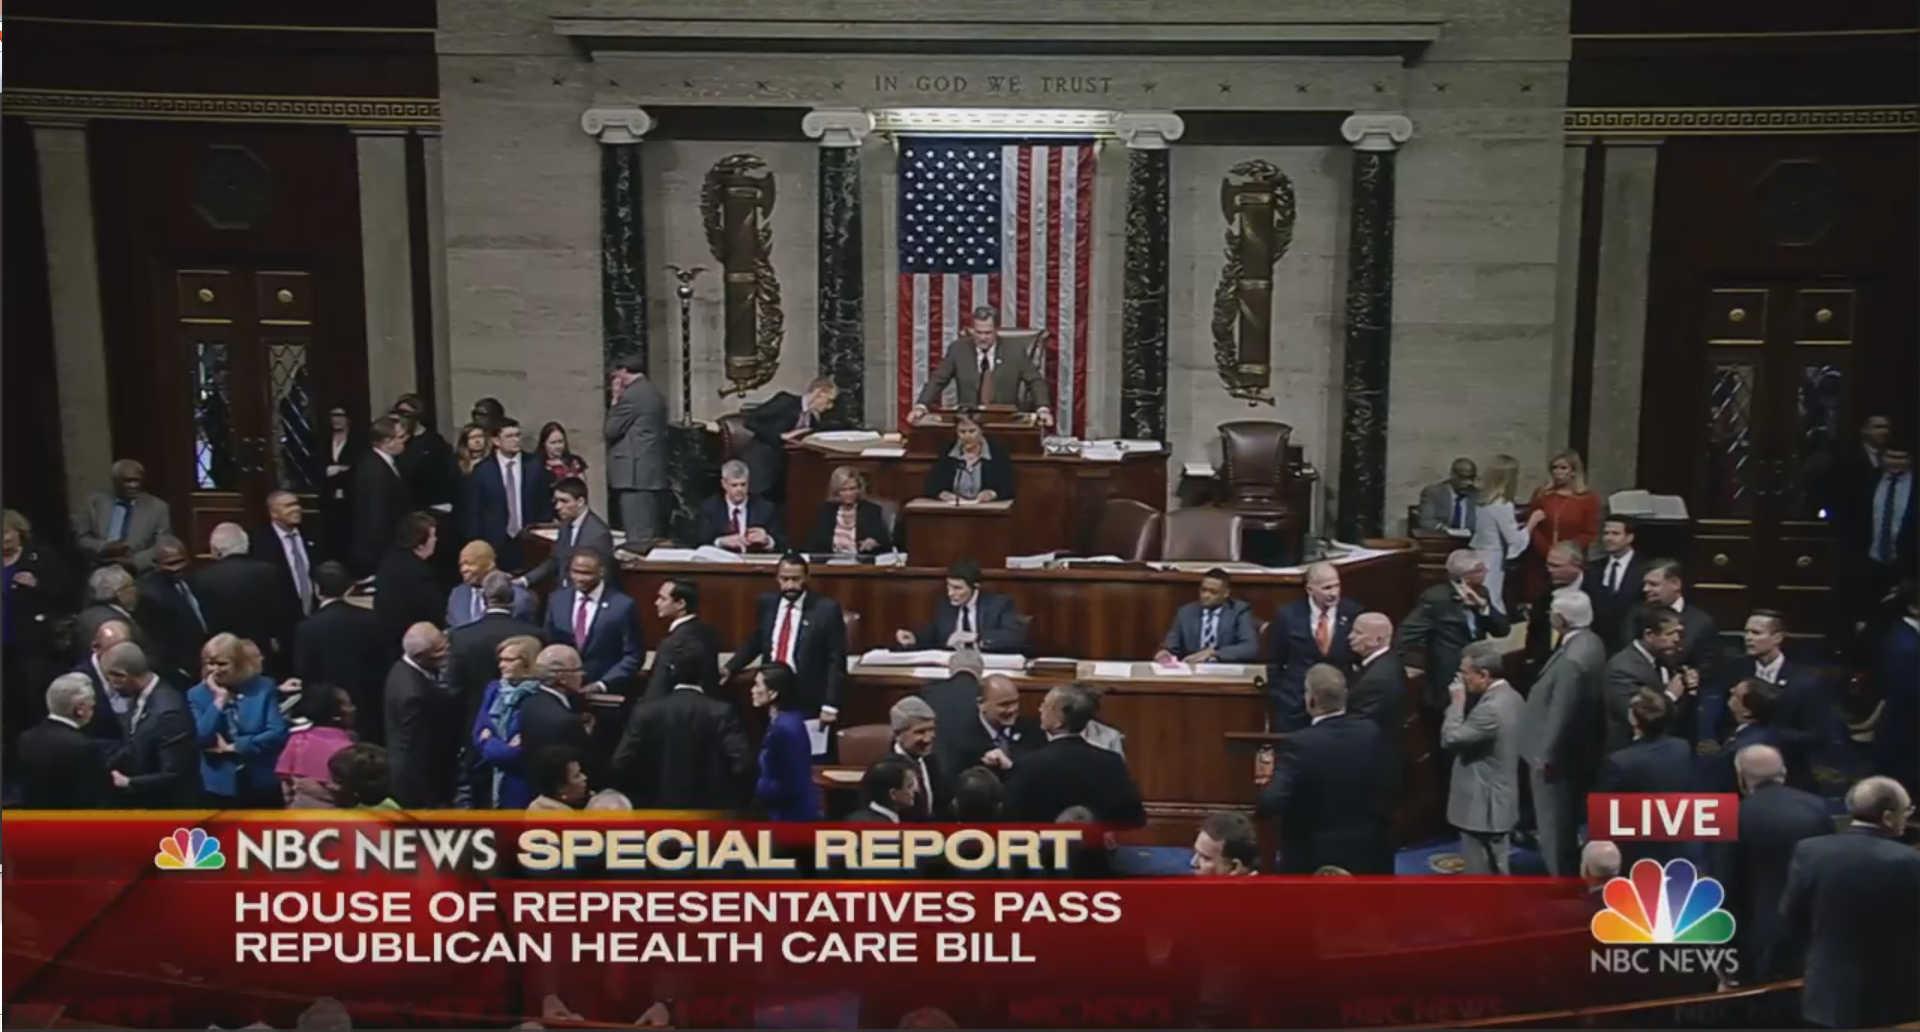 House Narrowly Passes Republican Health Care Bill